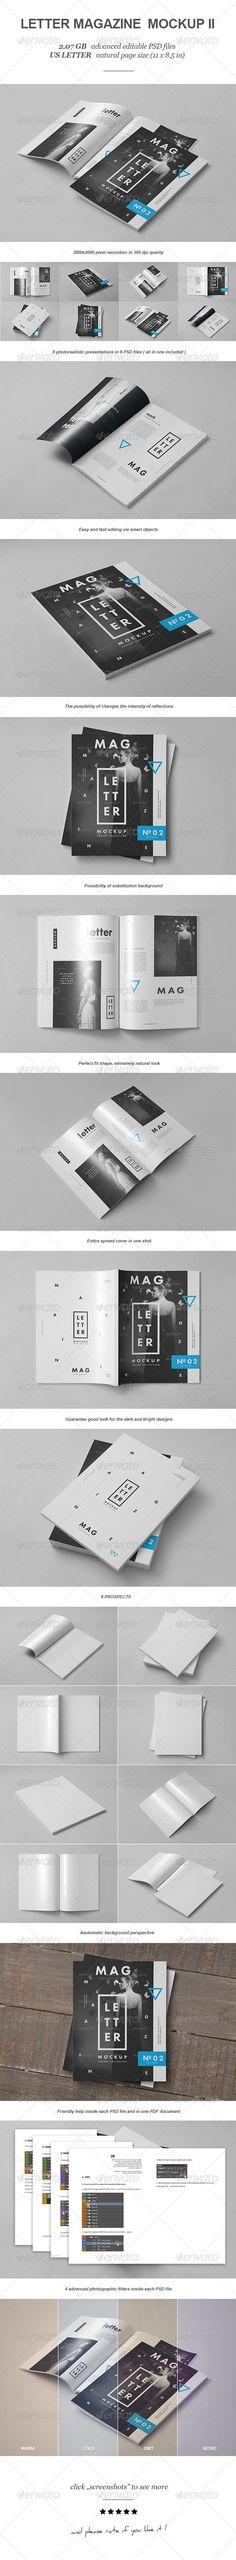 Letter Magazine / Brochure Mock-up #magazinemockup #brochuremockup #journalmockup Download: http://graphicriver.net/item/letter-magazine-brochure-mockup-ii/8234615?ref=ksioks